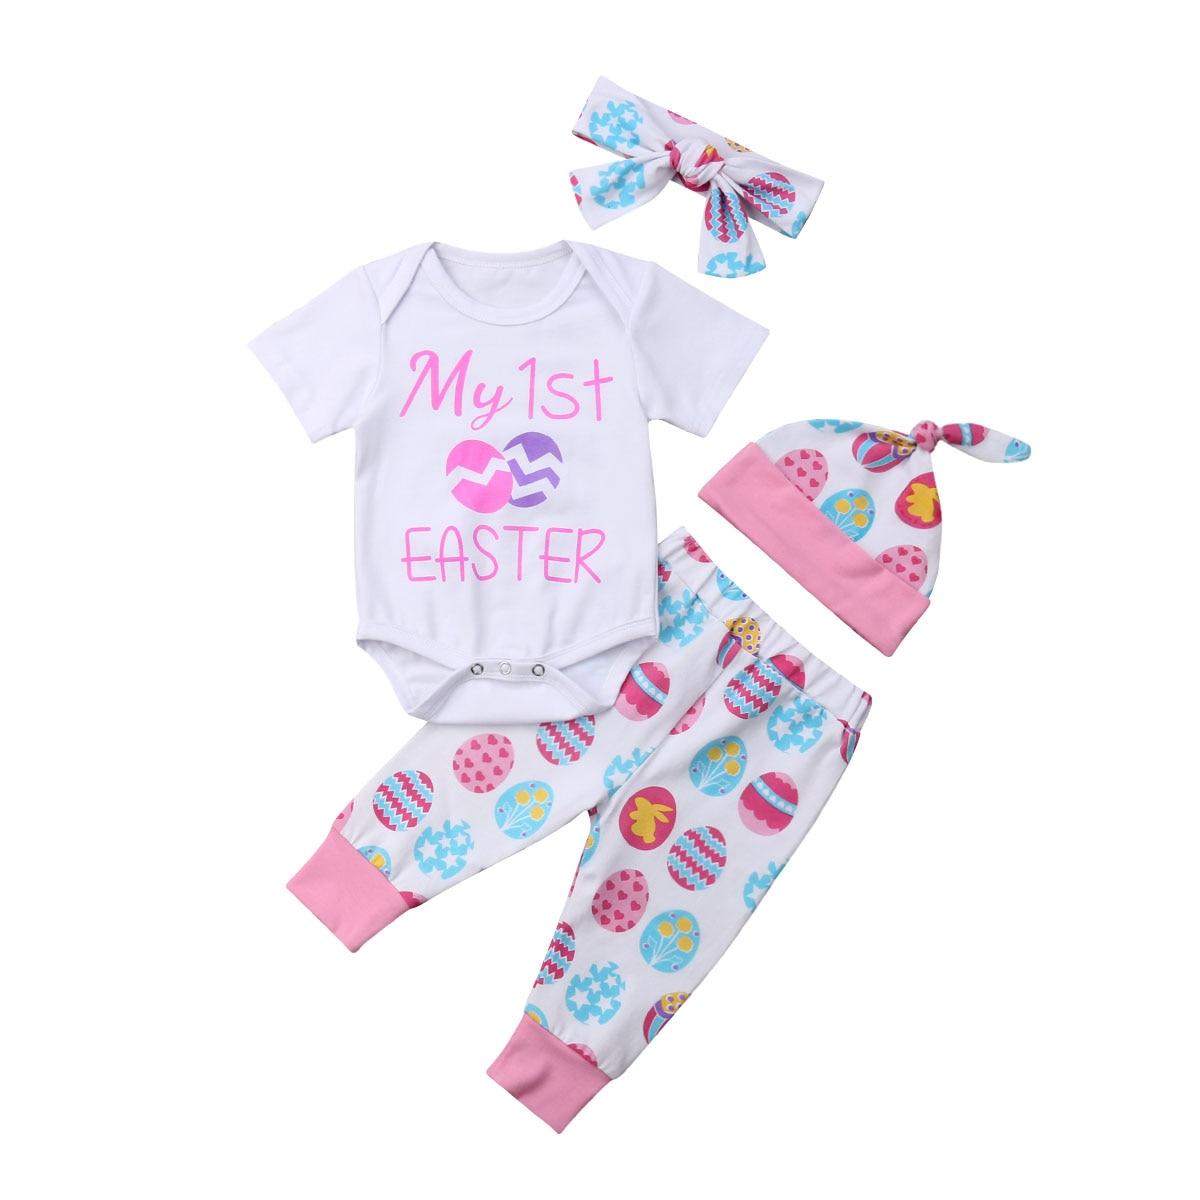 2020 Newborn Baby Girl Boy 0-24M My 1st Easter Romper Bodysuit+Pants Hat Outfit Set UK